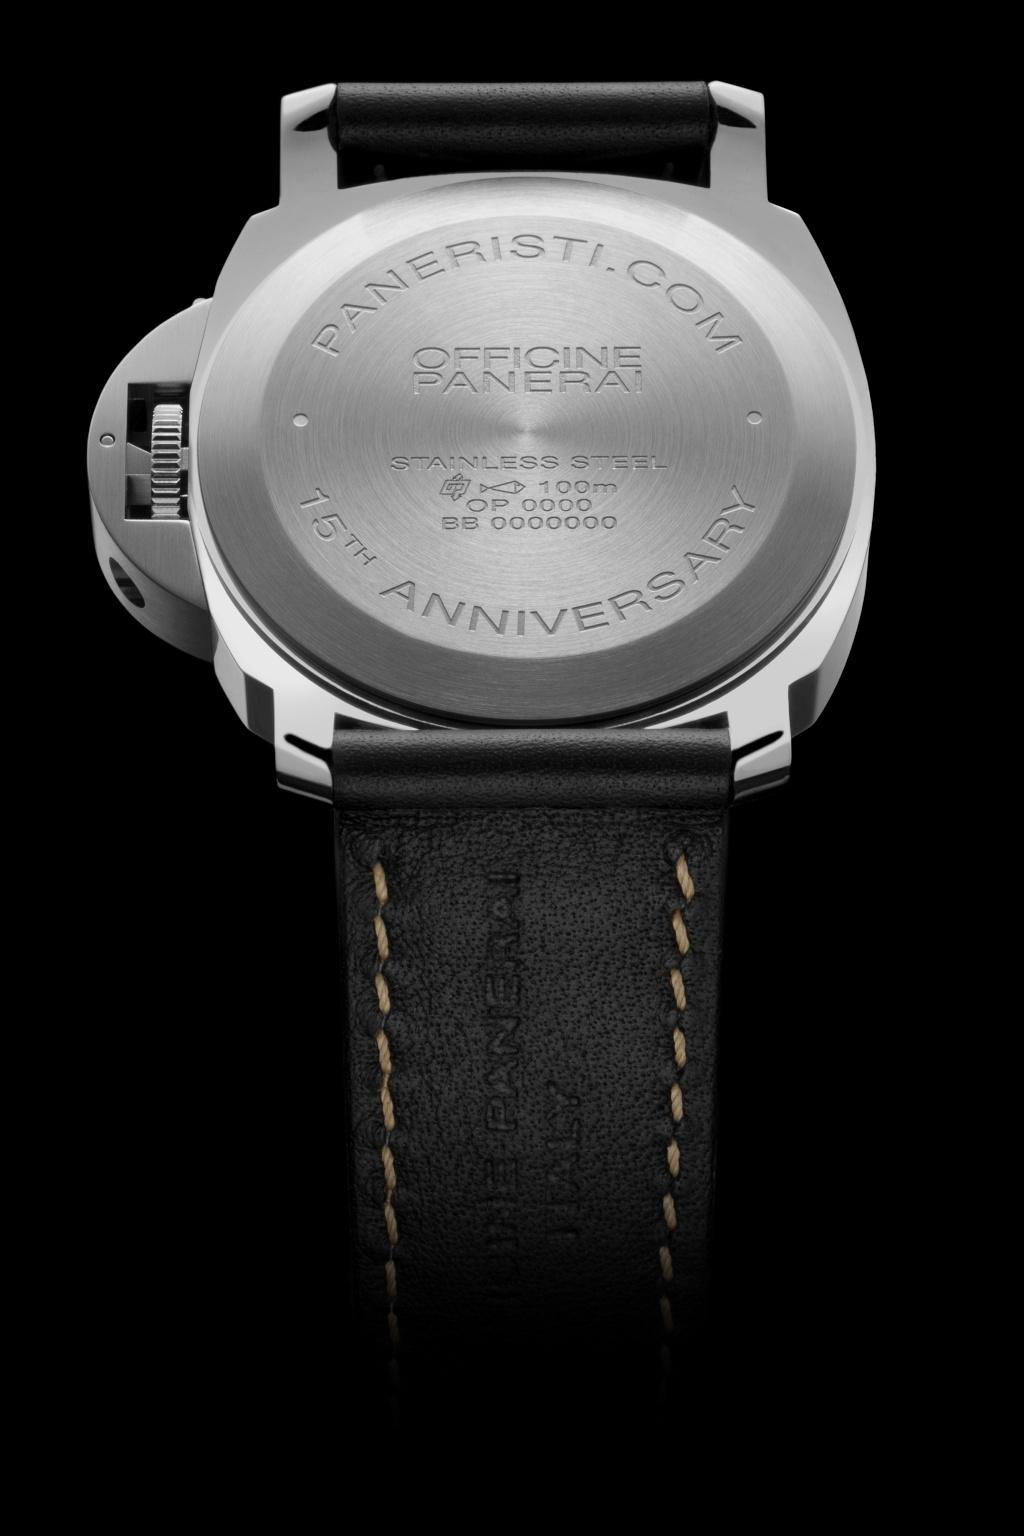 Communiqué de Presse : LUMINOR BASE LOGO ACIER -15th Anniversary Paneristi.com– 44mm - PAM00634 Pam63413